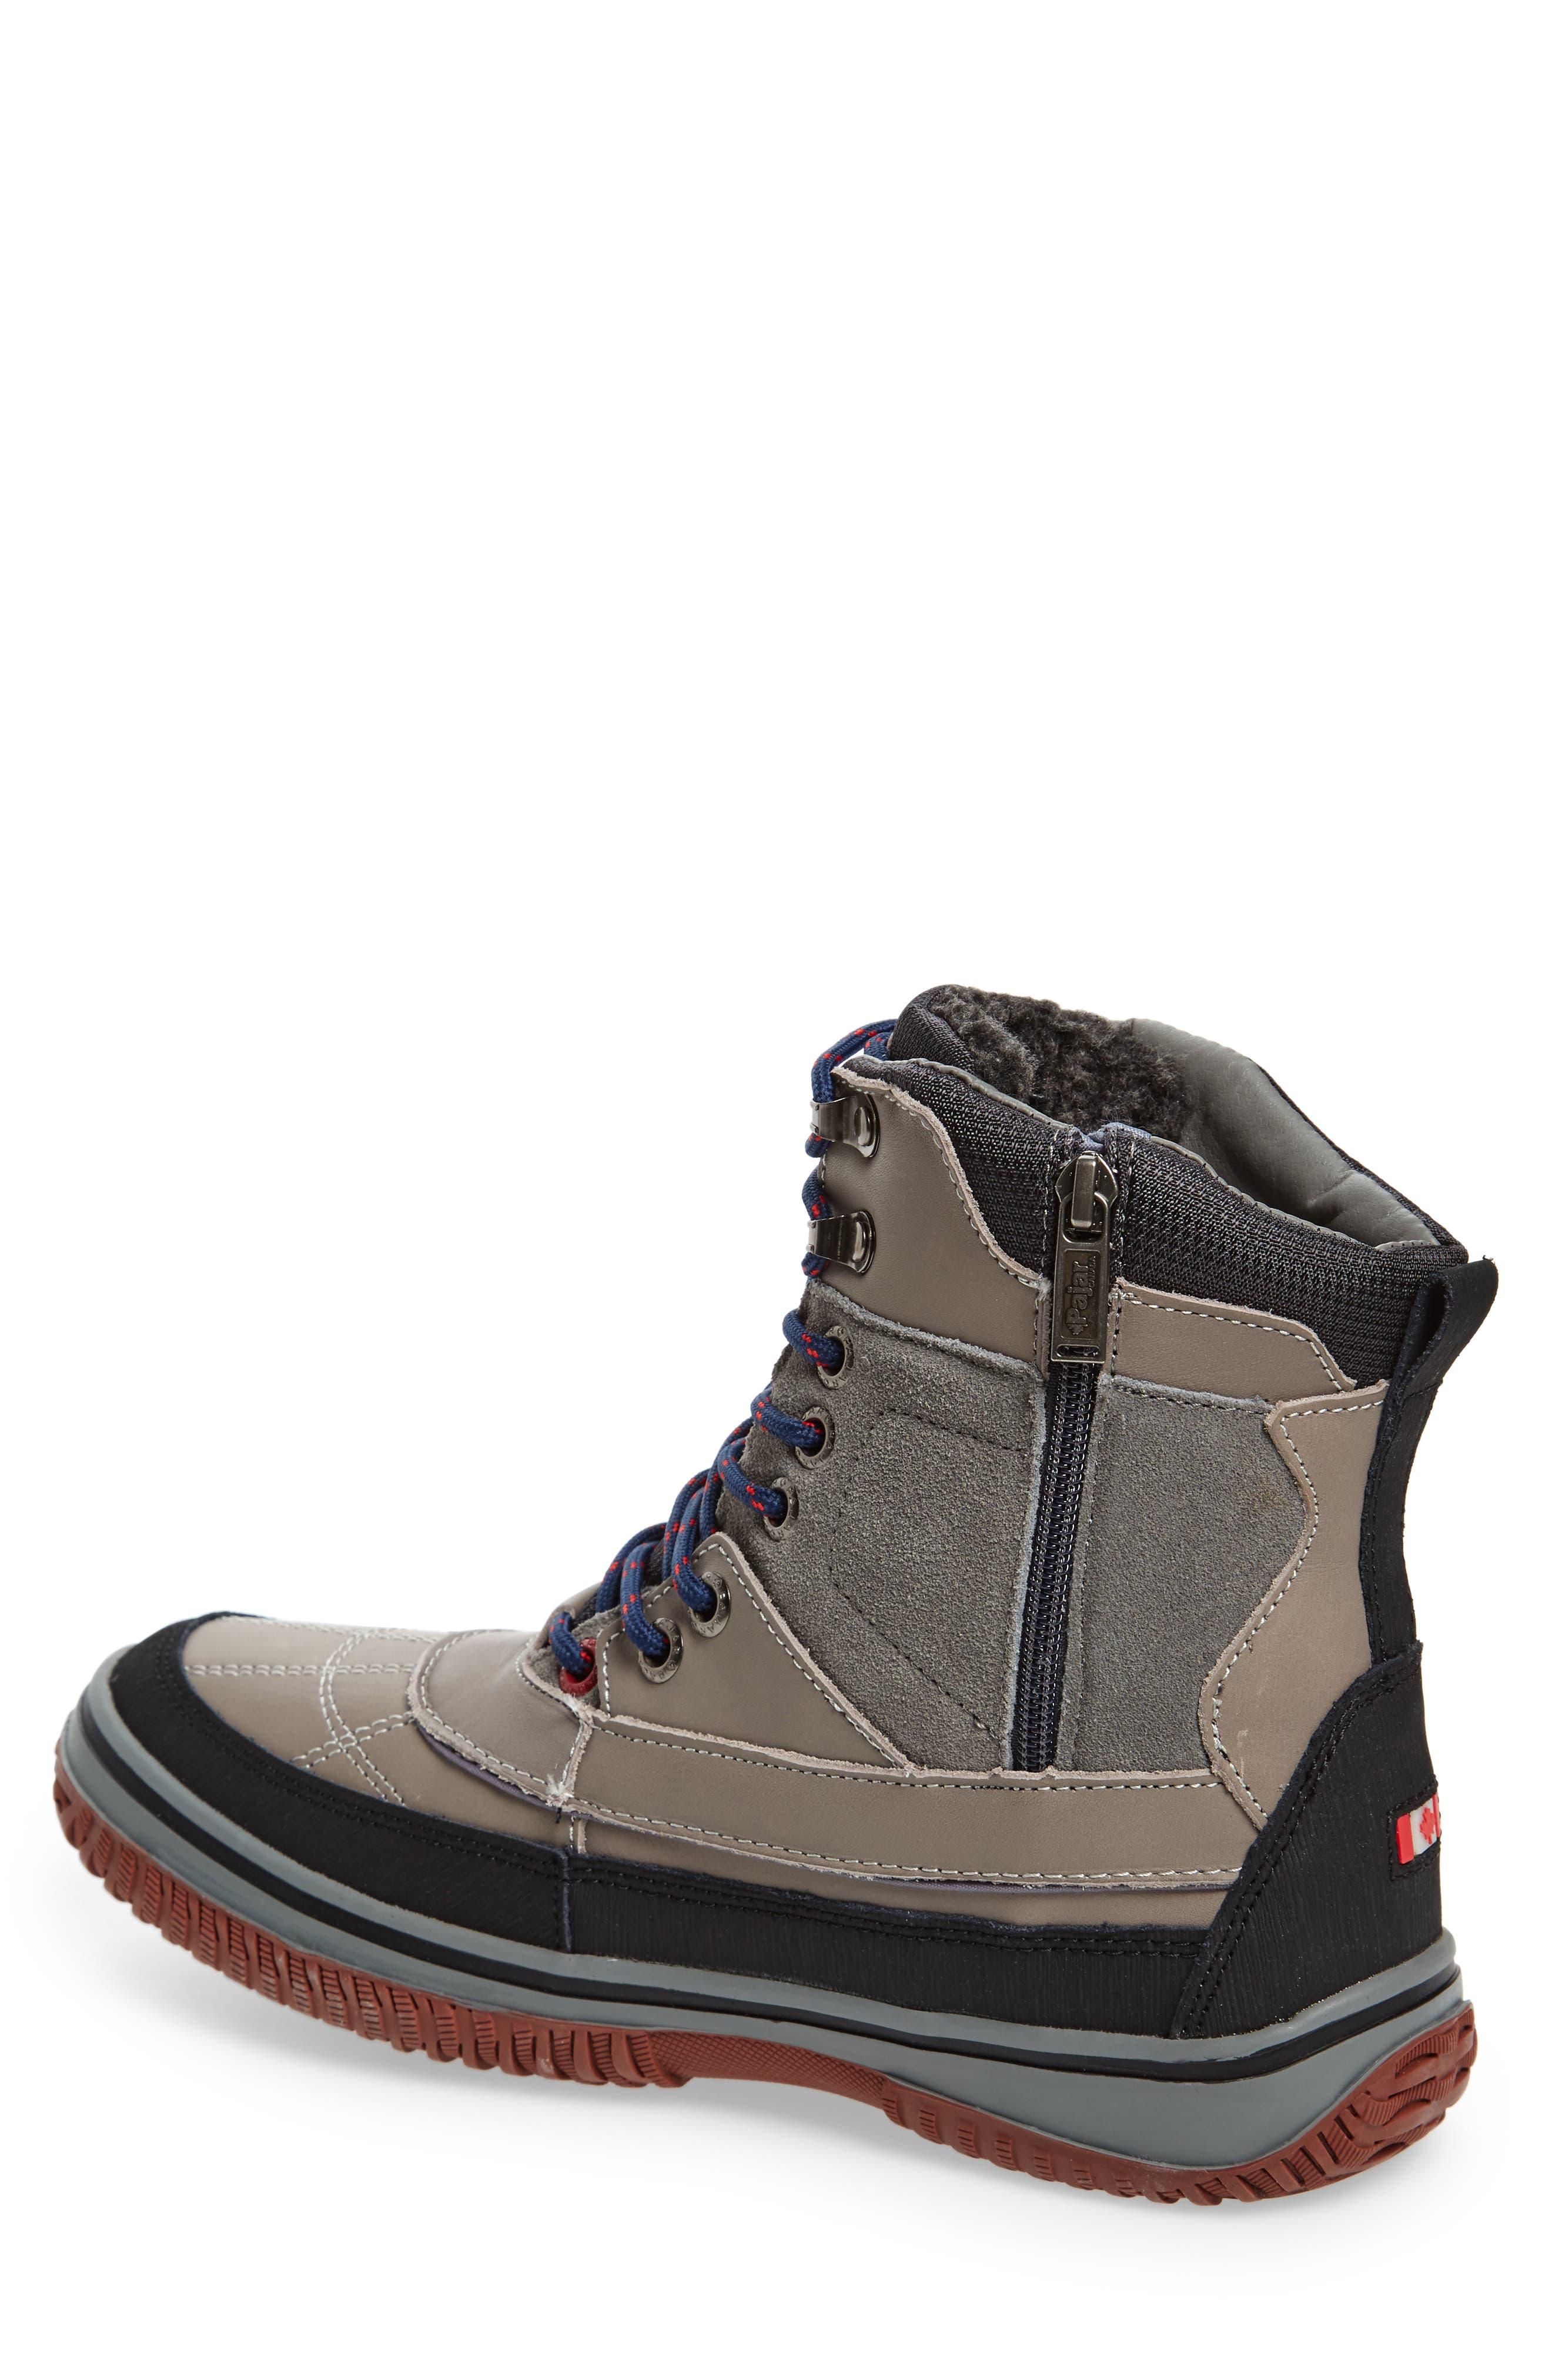 Gaspar Waterproof Winter Boot,                             Alternate thumbnail 2, color,                             Grey Leather